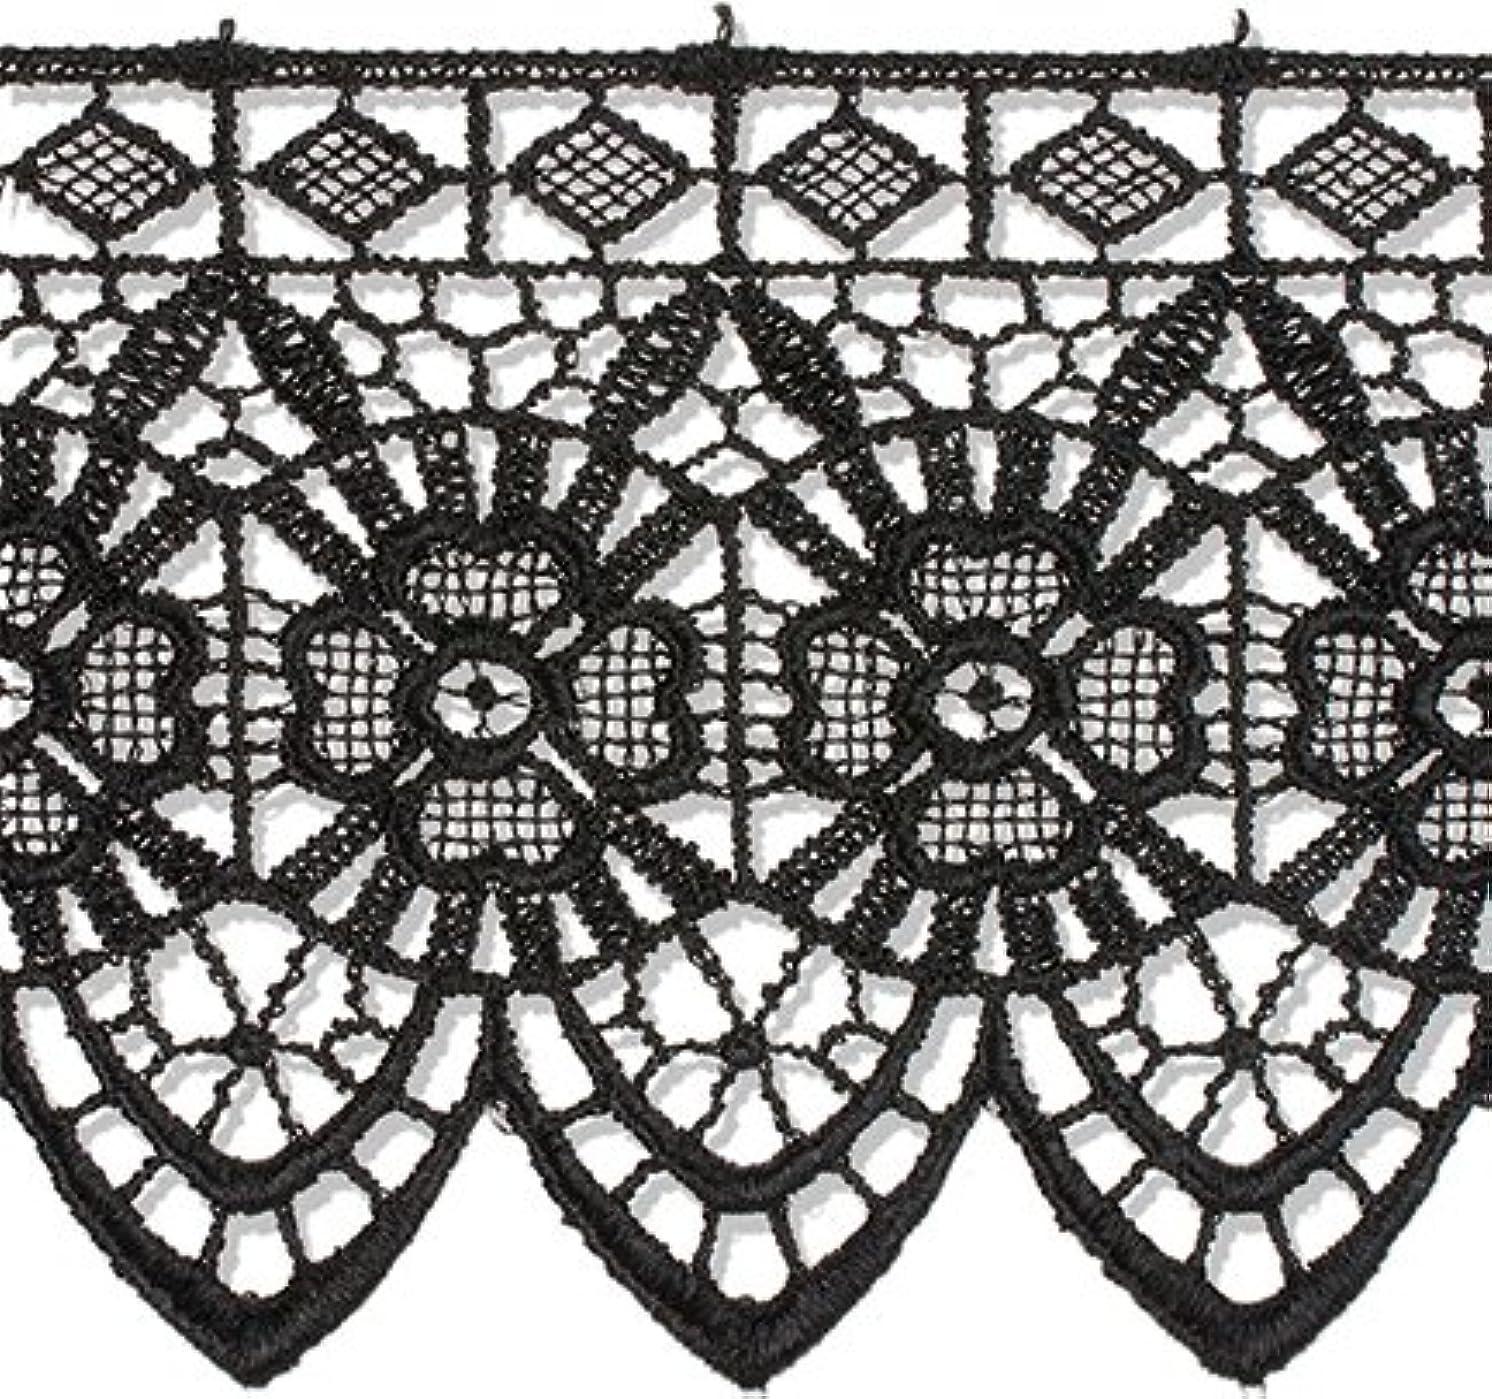 Decorative Trimmings Black Gothic Rose Edge Venice Lace Trim 3